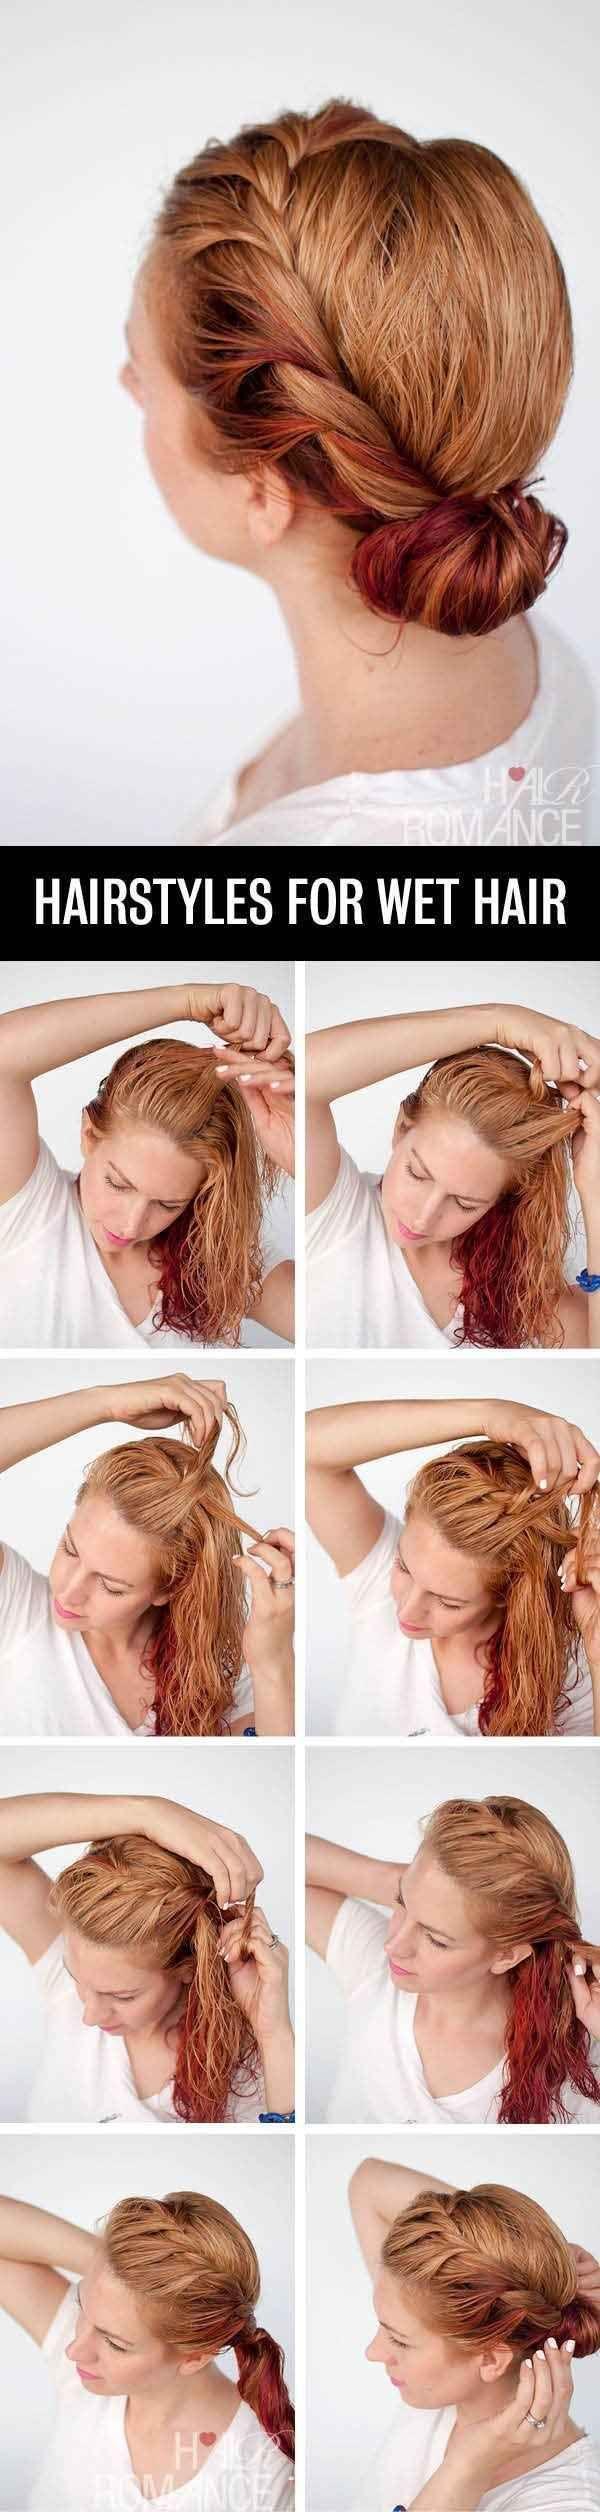 Amazing 1000 Ideas About Wet Hair Hairstyles On Pinterest Wet Short Hairstyles For Black Women Fulllsitofus